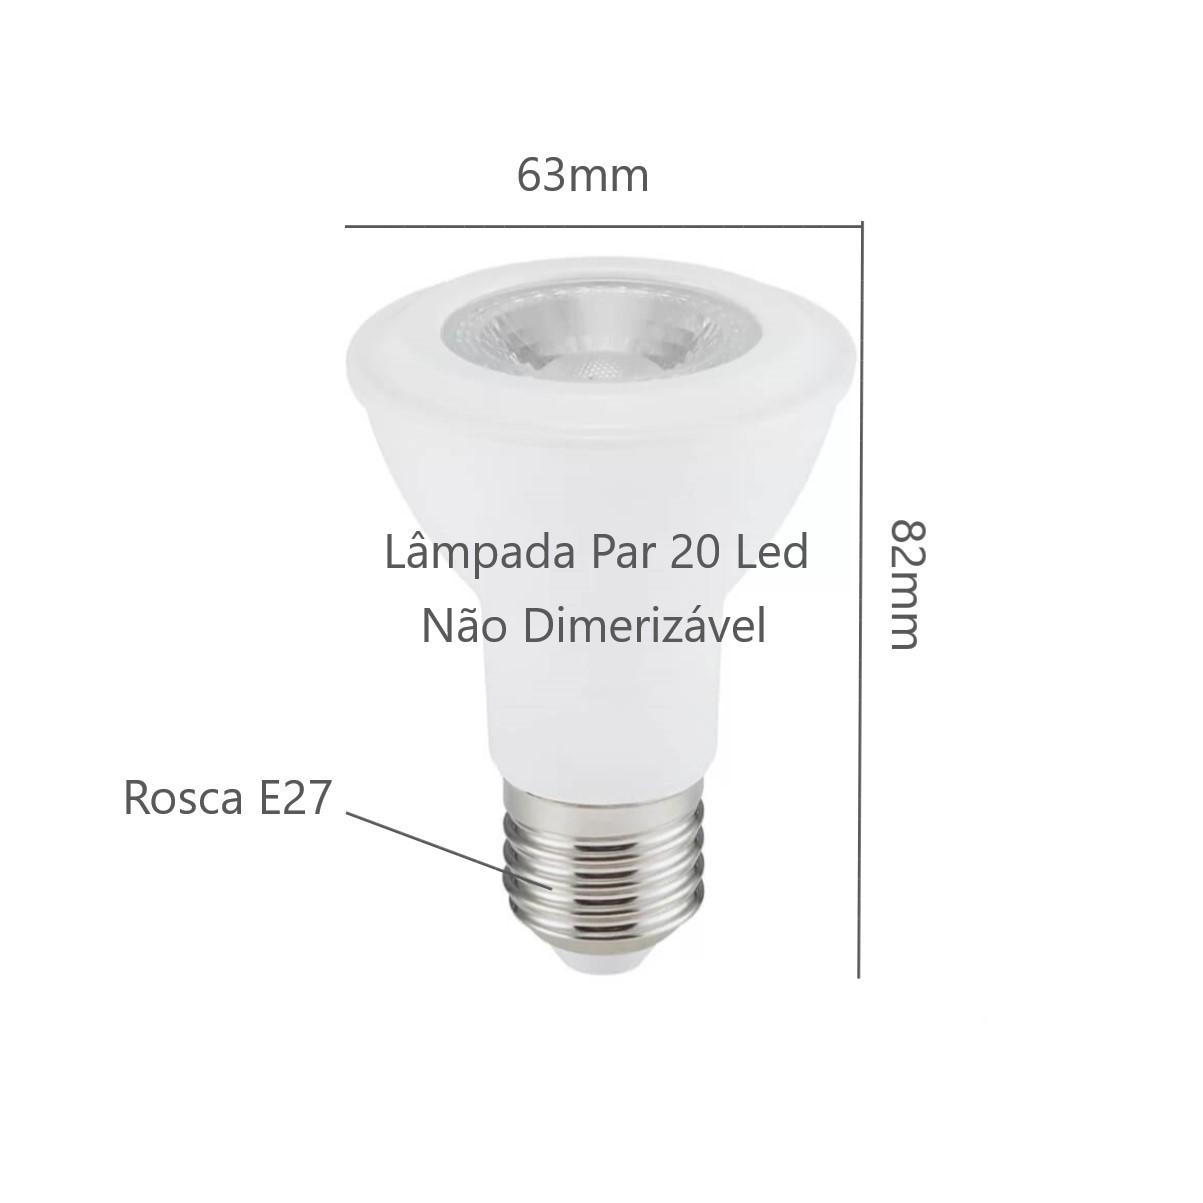 Kit Trilho Eletrificado 2m Branco Oko Nordecor + 4 Spot Par20 + Lâmp. Led Luz Quente